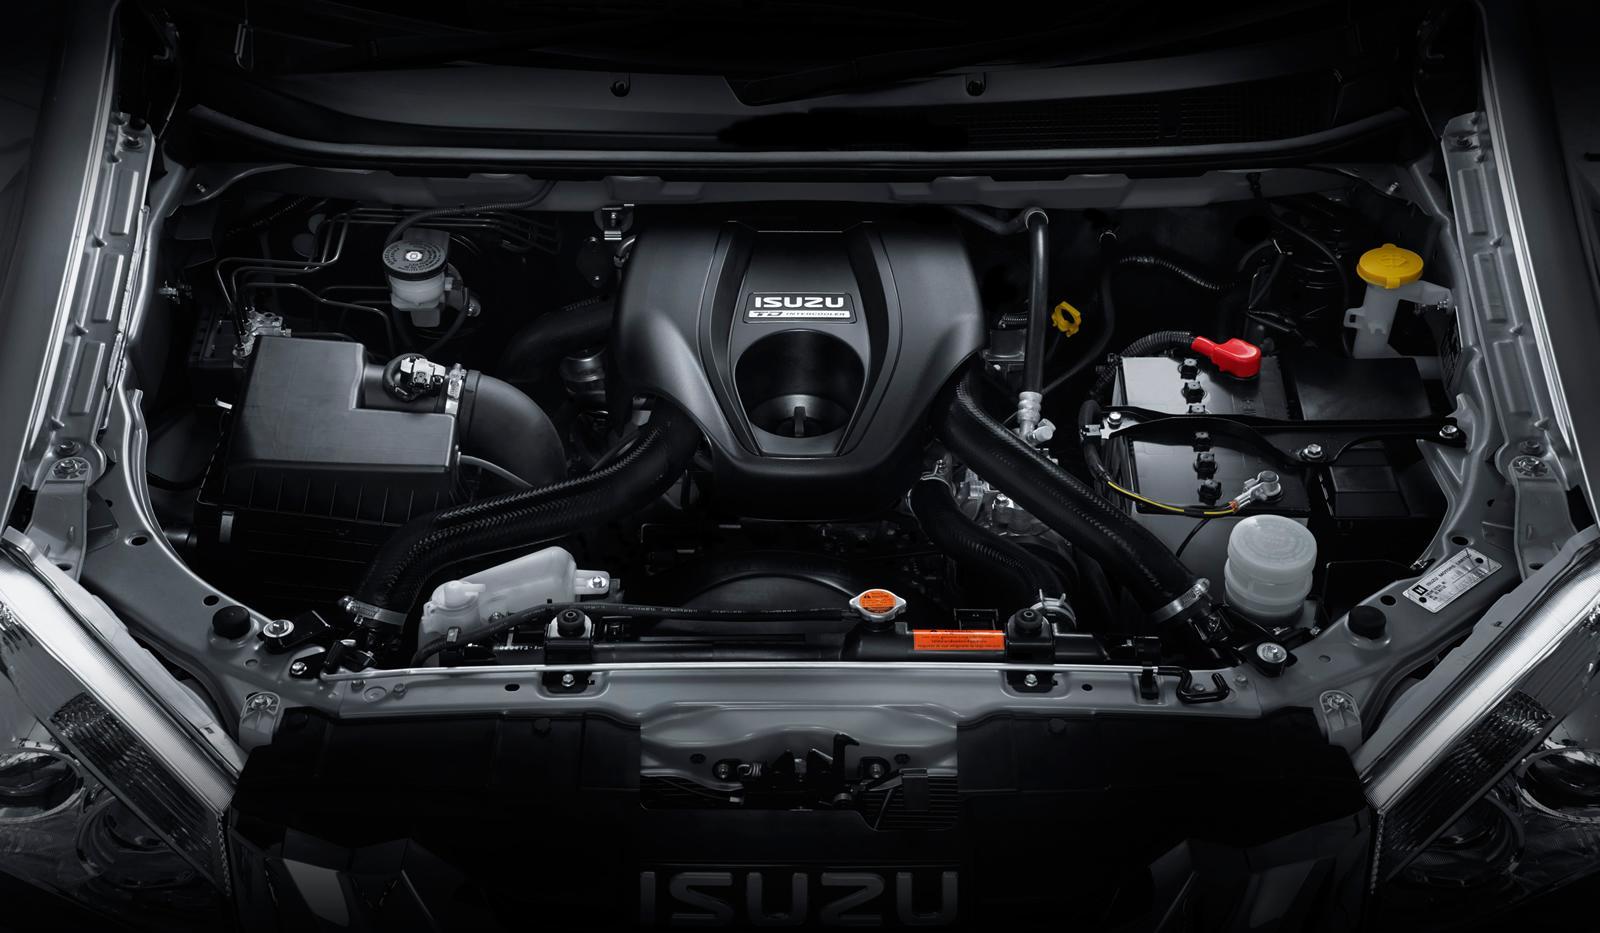 Isuzu Launches New MU-X SUV [Video] - autoevolution